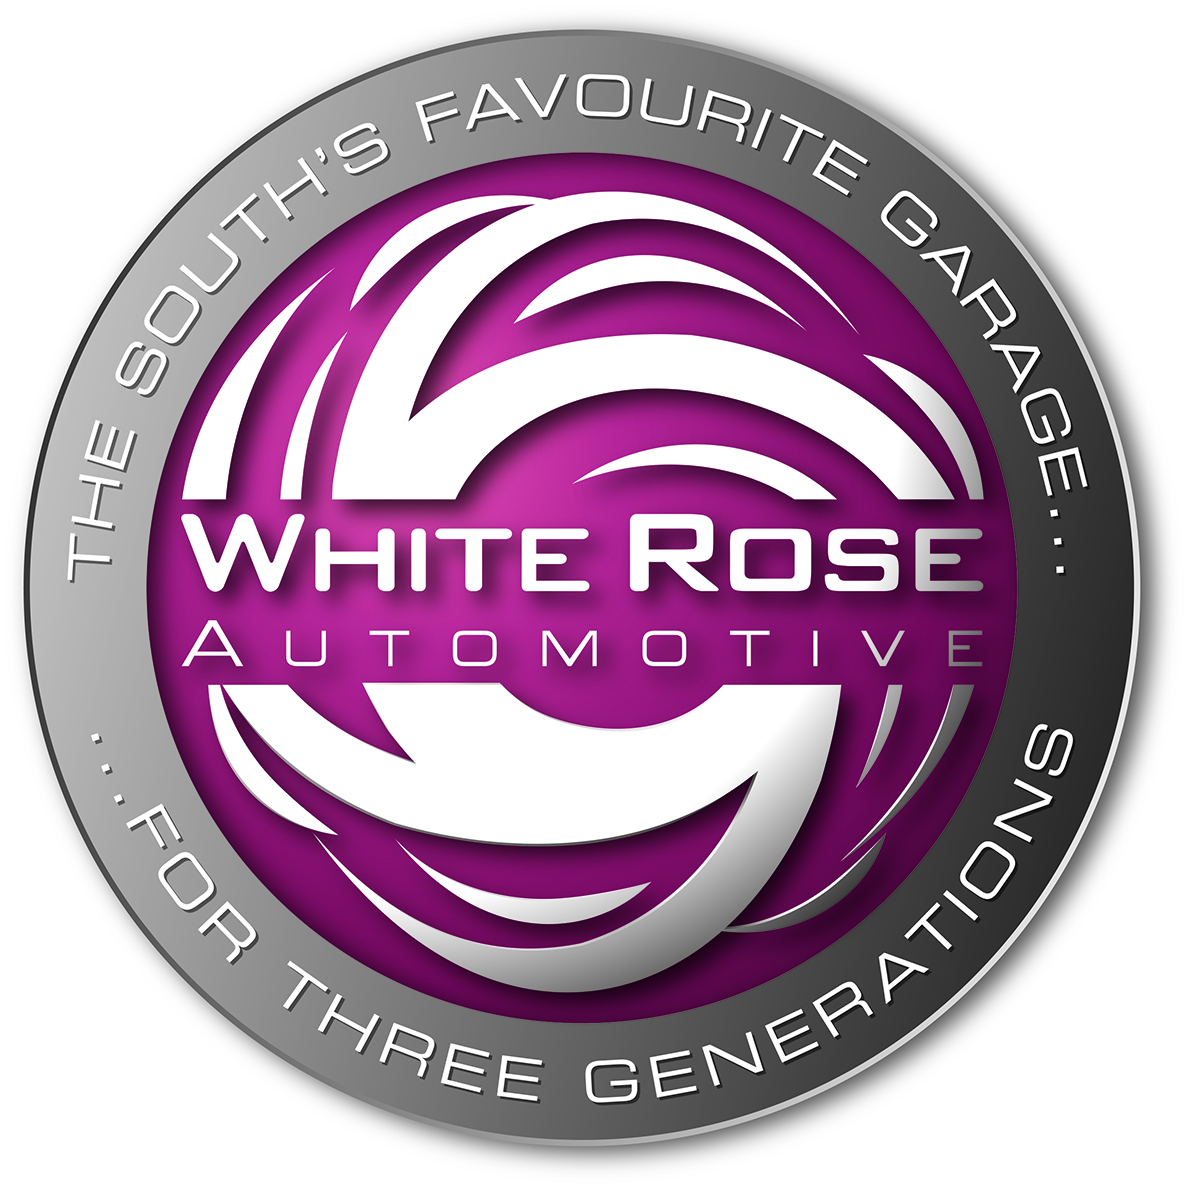 White Rose Automotive